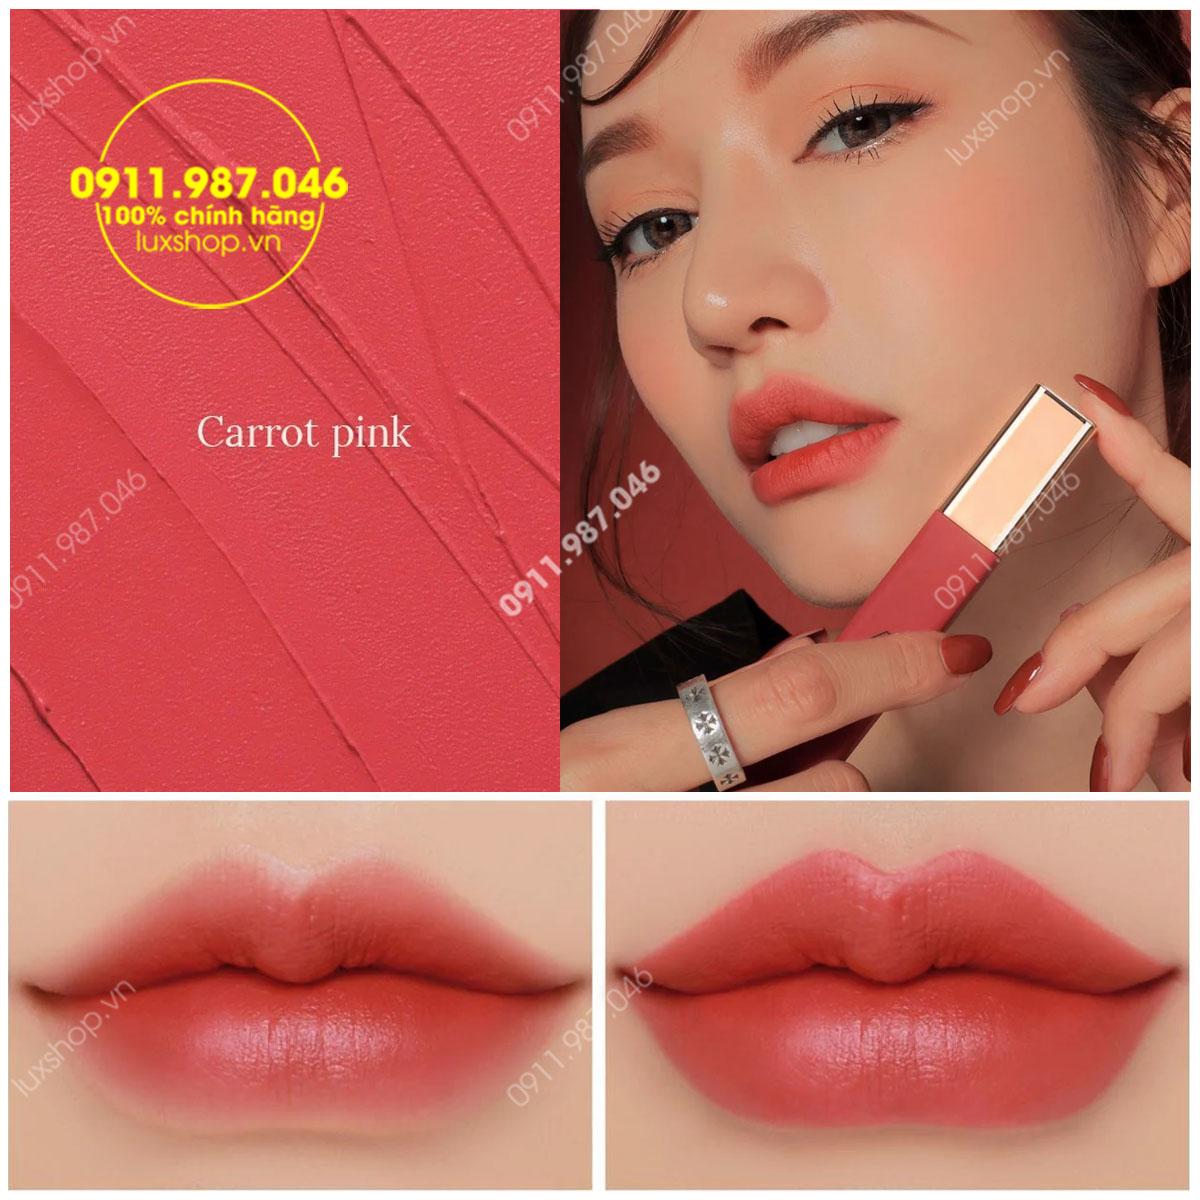 Son 3CE Kem Cloud Lip Tint Màu Carrot Pink (Vừa Ra Mắt)